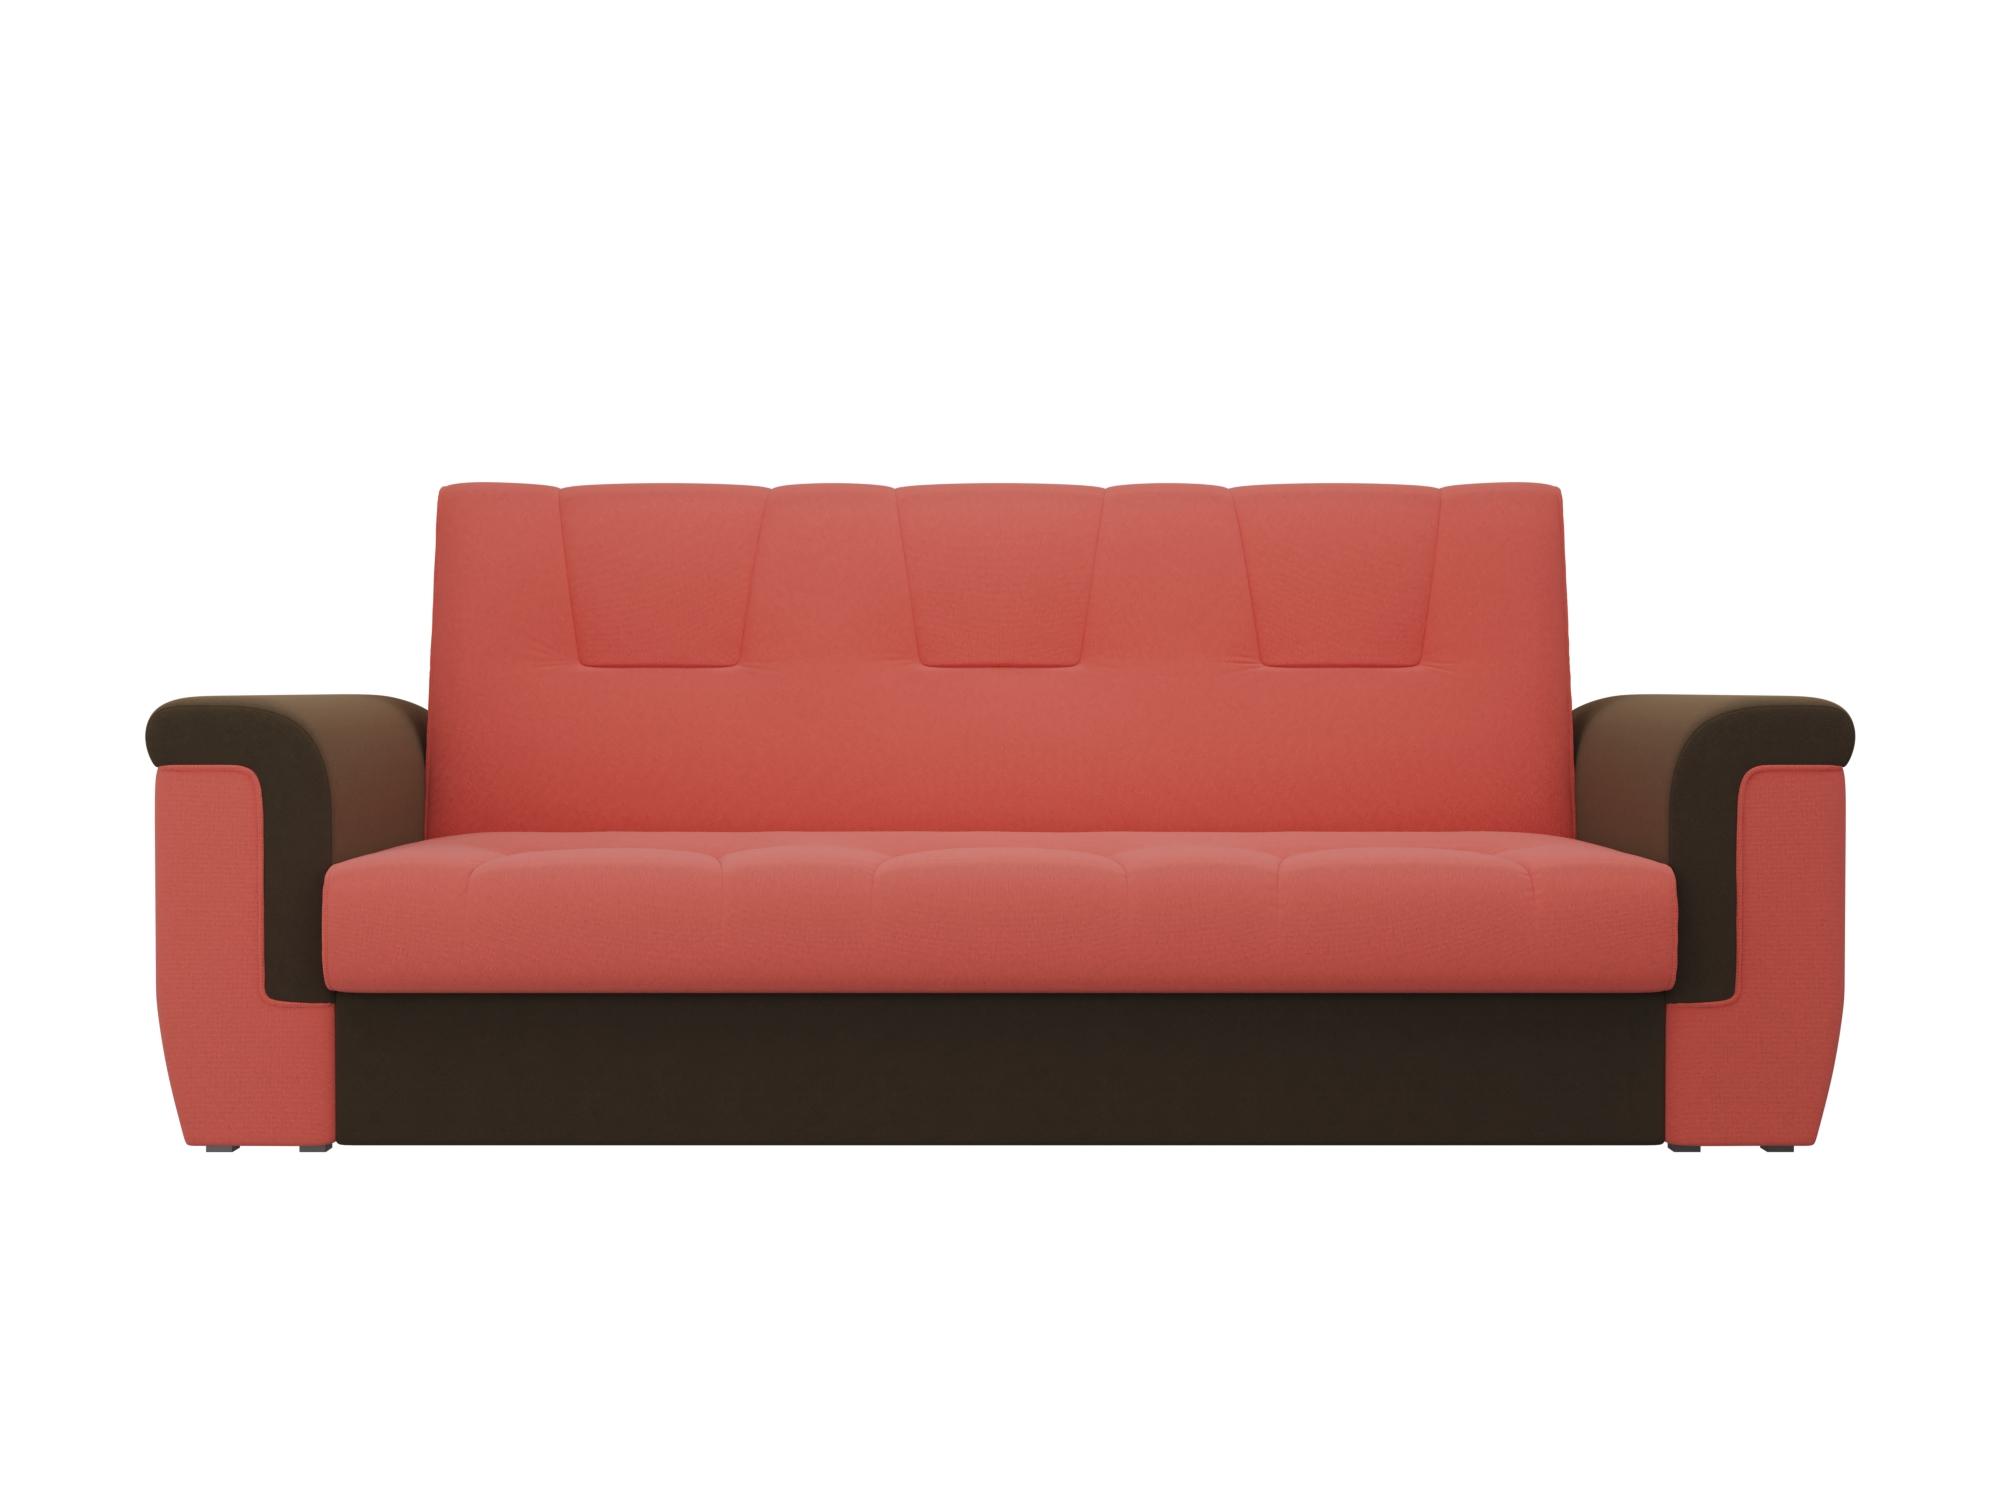 Диван Эллиот MebelVia Красный, Коричневый, Микровельвет, ЛДСП Коричневый, Красный